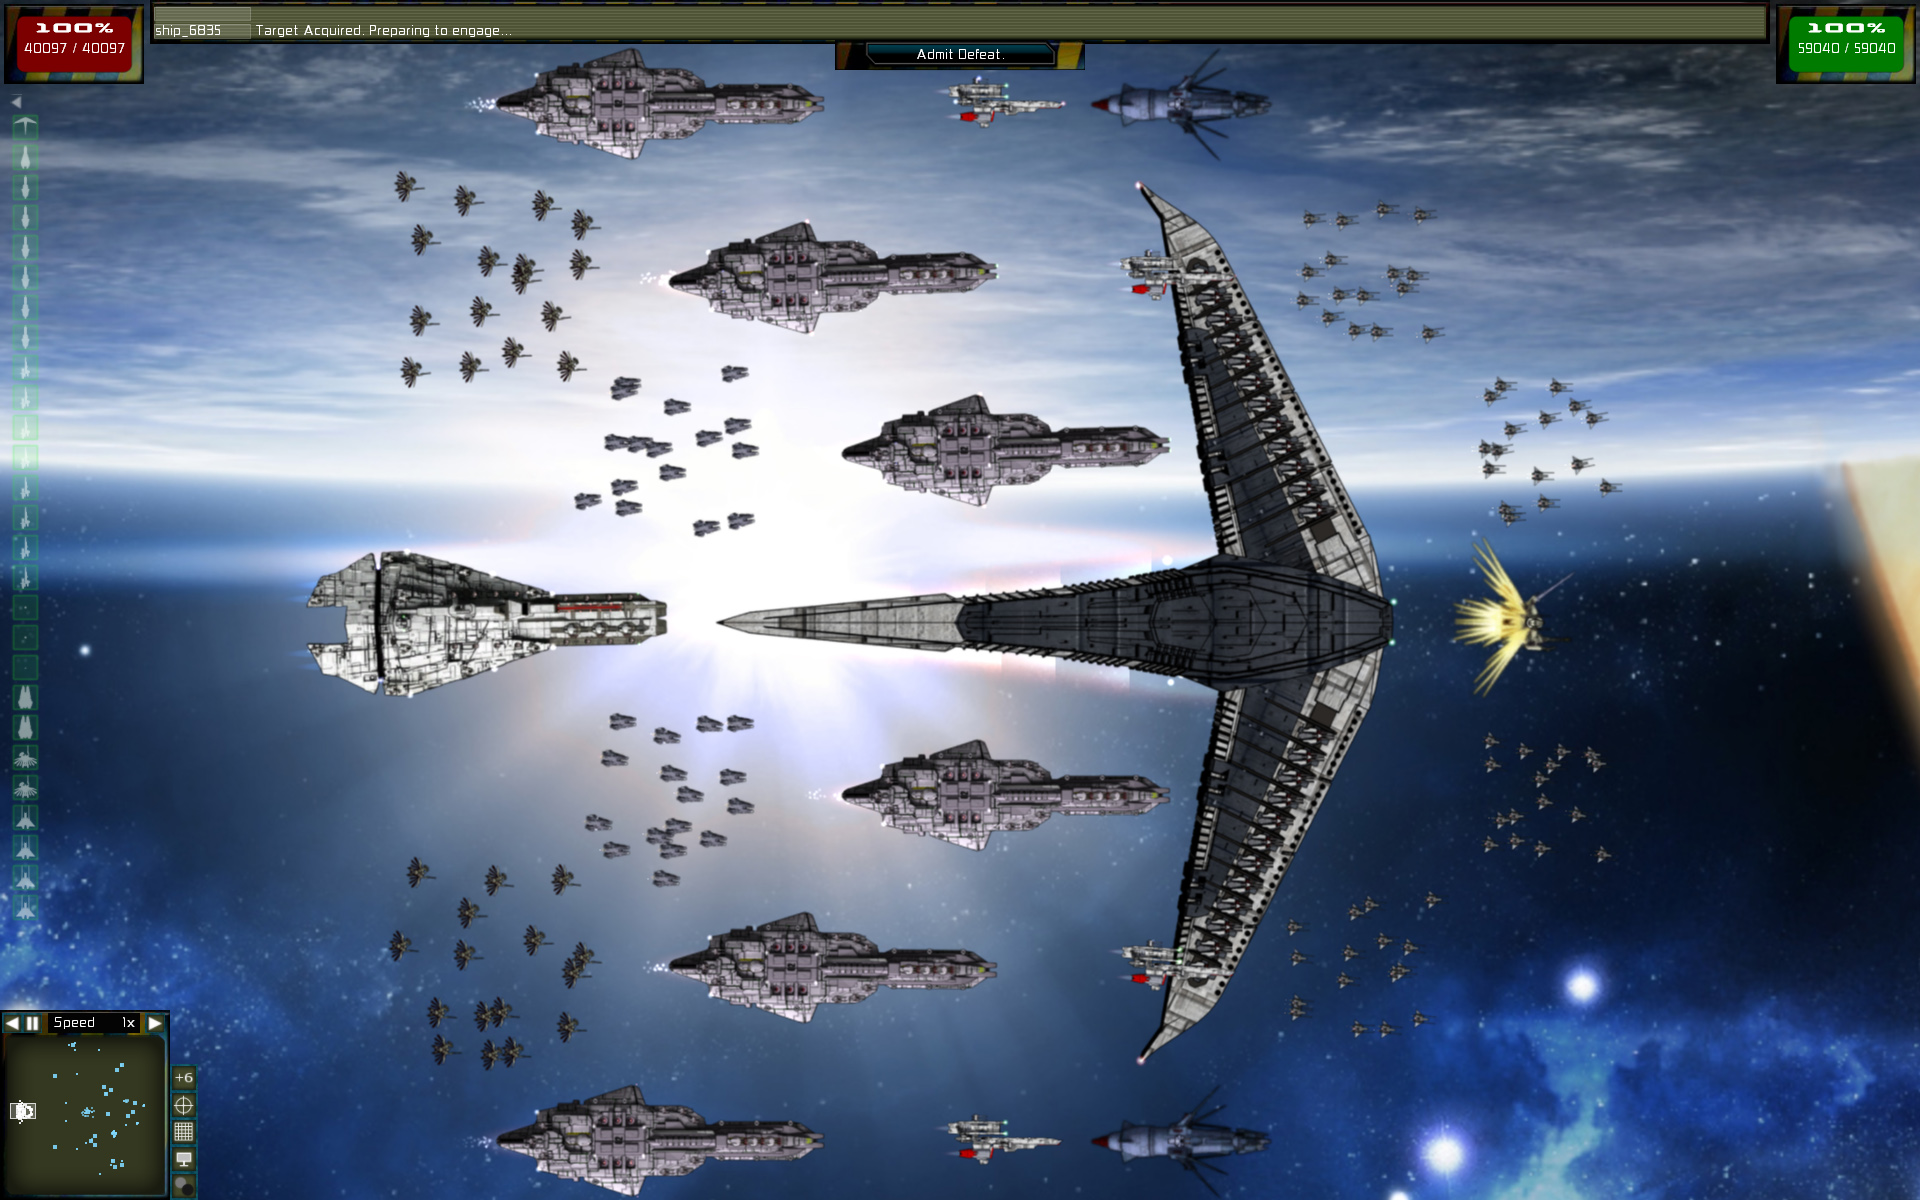 Big experimental ship image fantasy fleet 2 mass effect - Spacebattles com ...